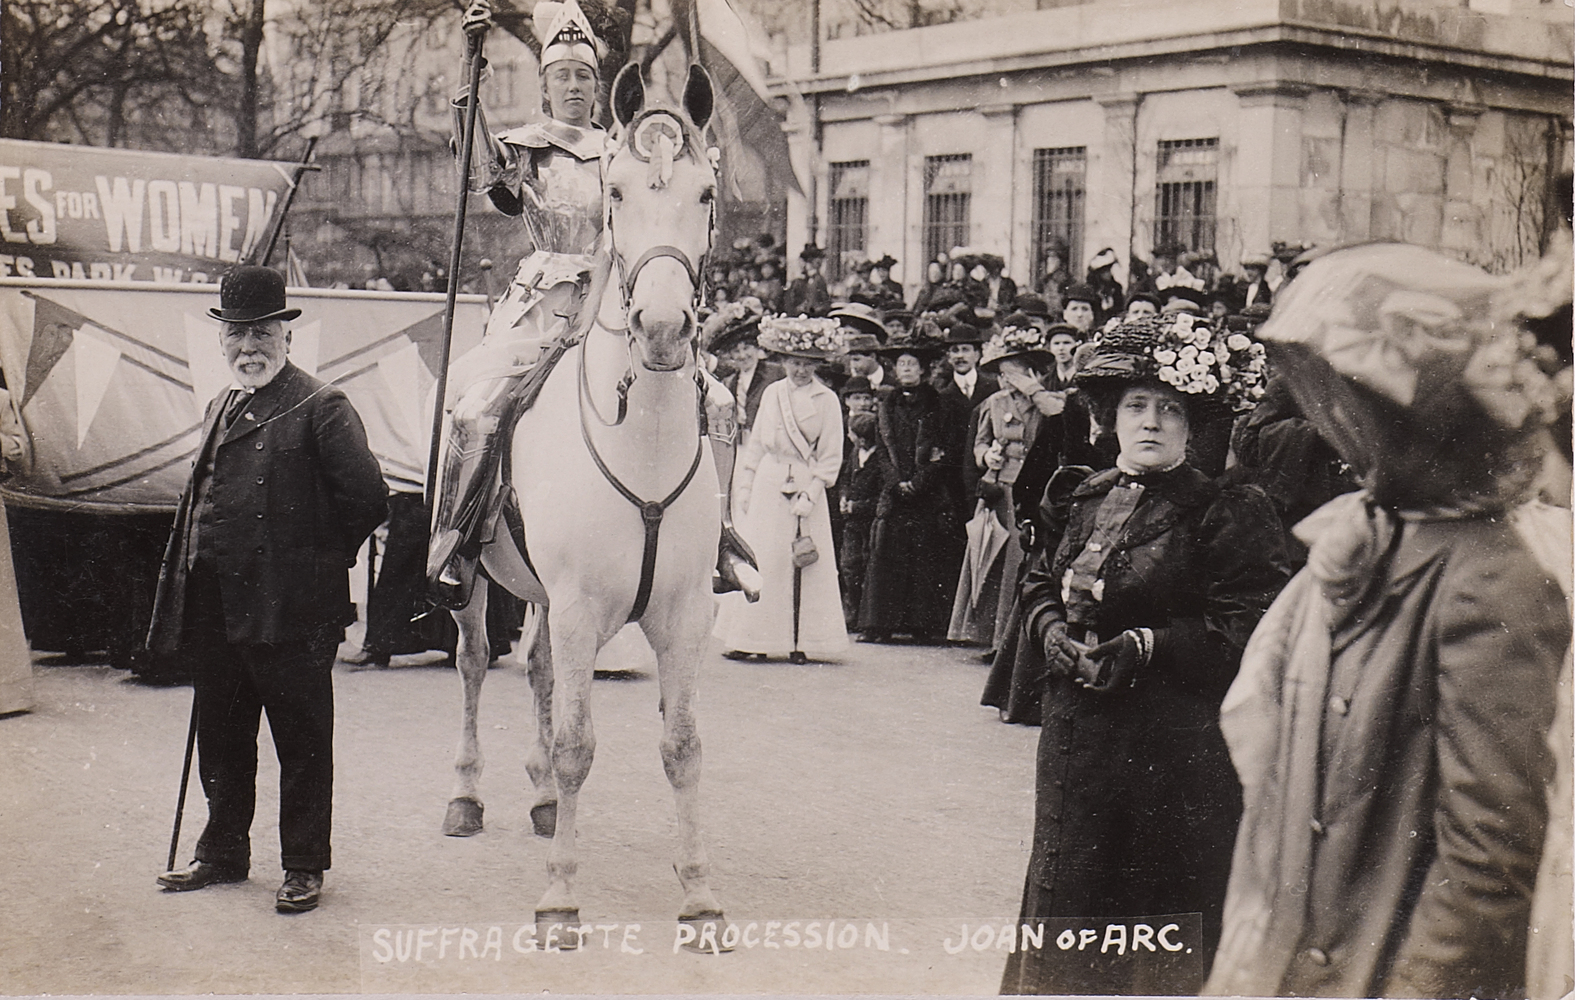 Postcard, Suffragette procession, Joan of Arc. c. 1910